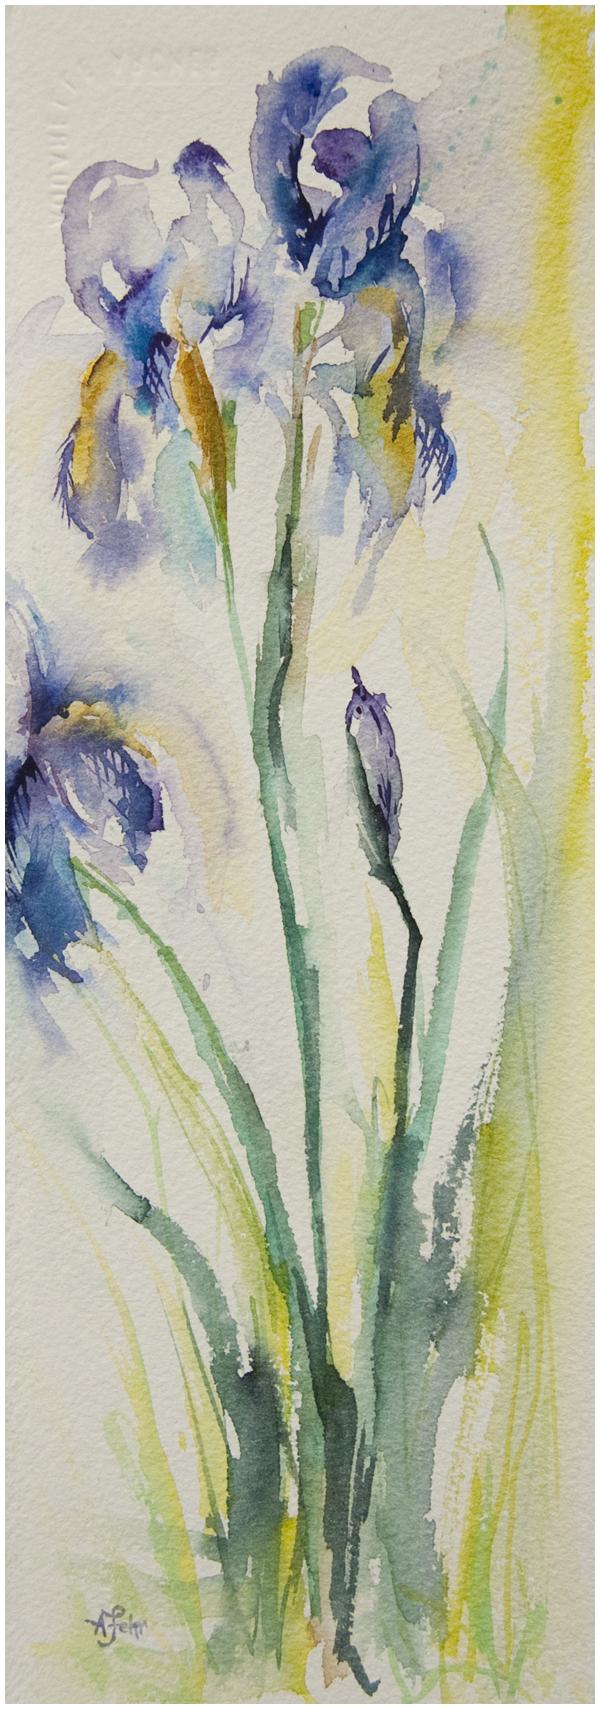 Irises in watercolour | Angela Fehr